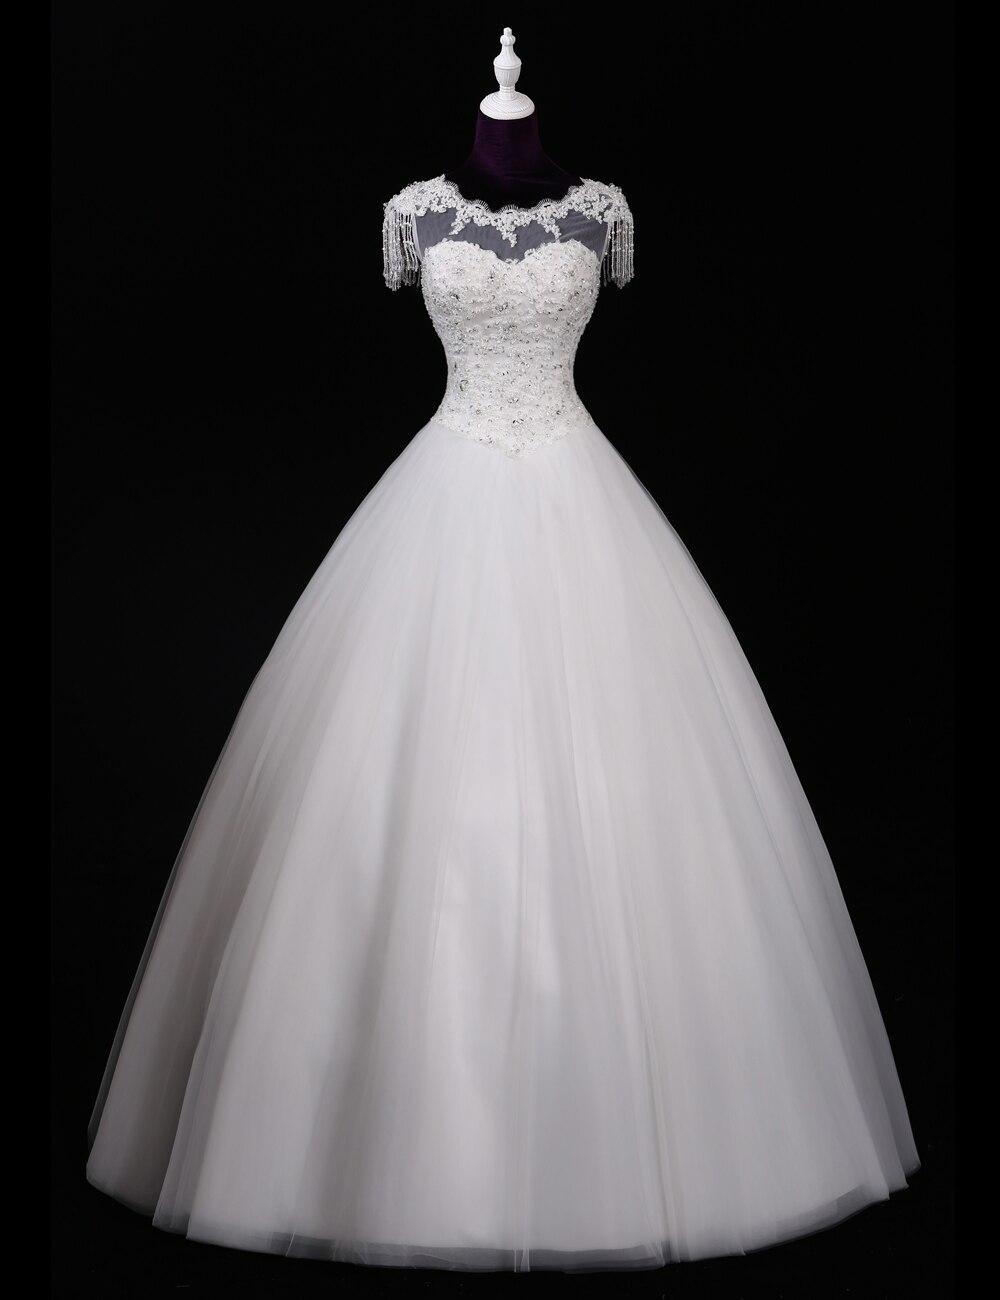 Vestido De Noiva Princesa Vintage White Lace Wedding Dress 2016 Ball Gown Wedding Dresses China Plus Size Bridal Gowns Casamento